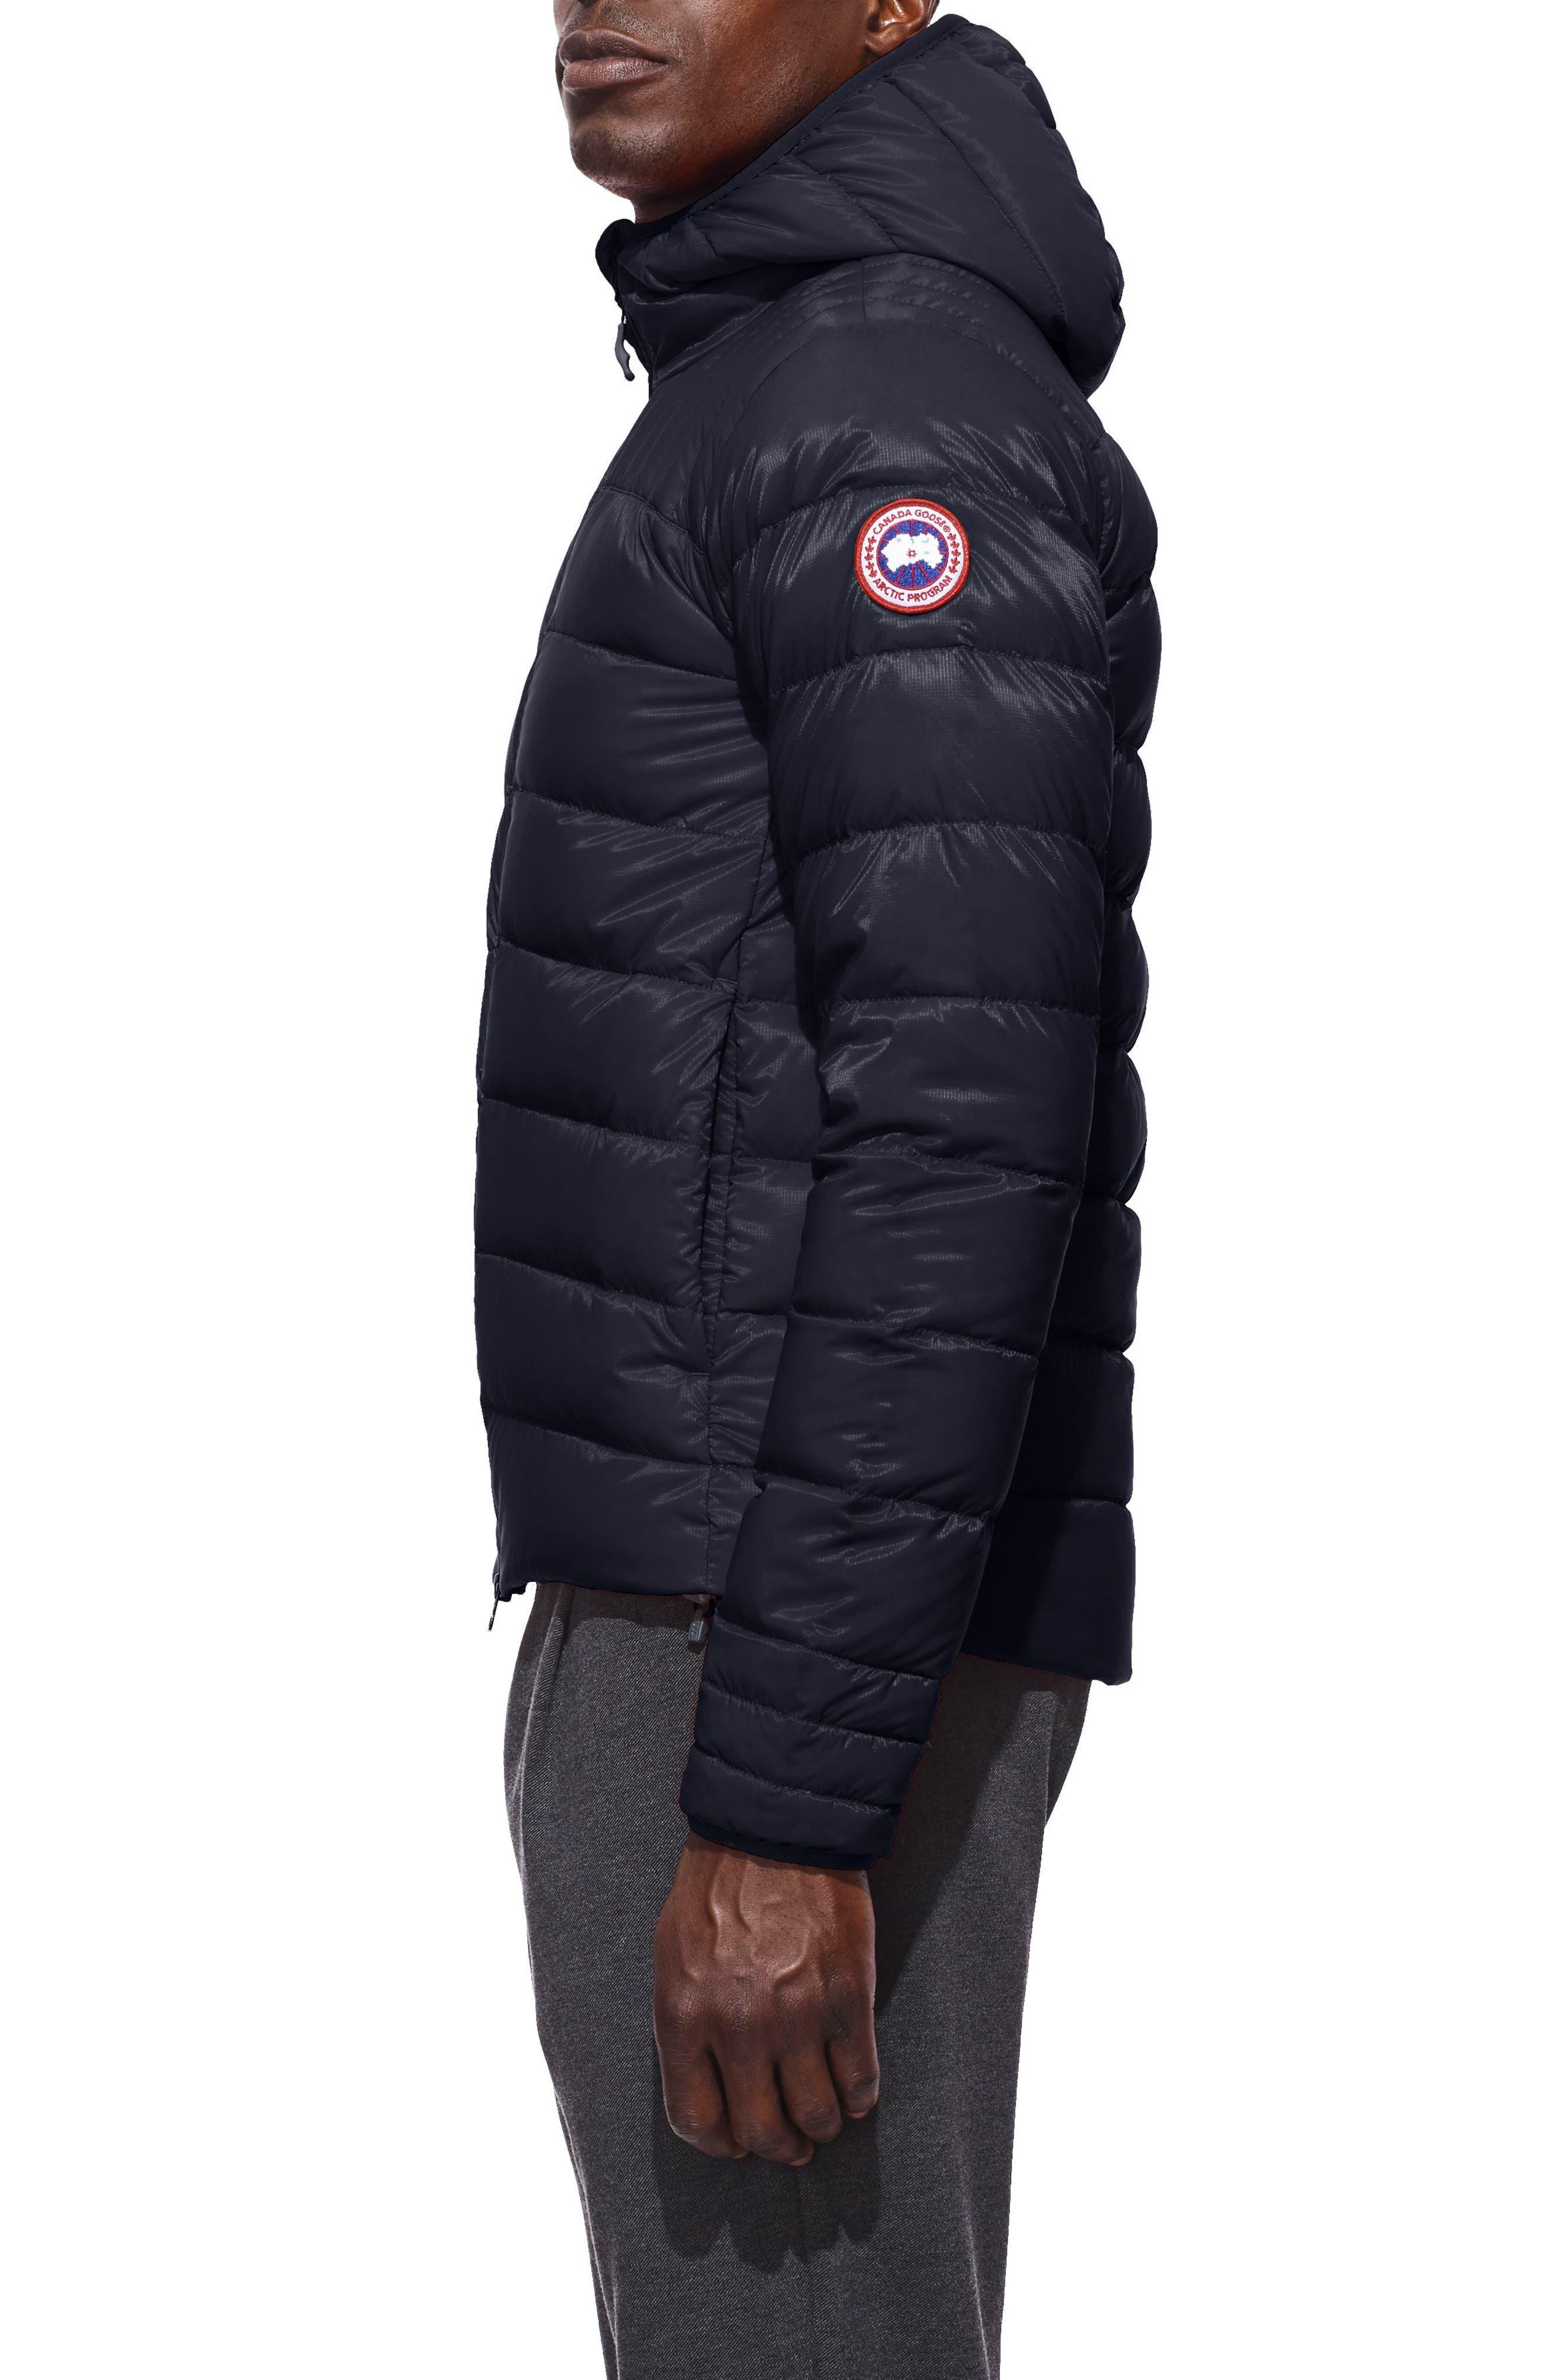 CANADA GOOSE, Brookvale Slim Fit Hooded Down Jacket, Alternate thumbnail 4, color, ADMIRAL BLUE/ BLACK